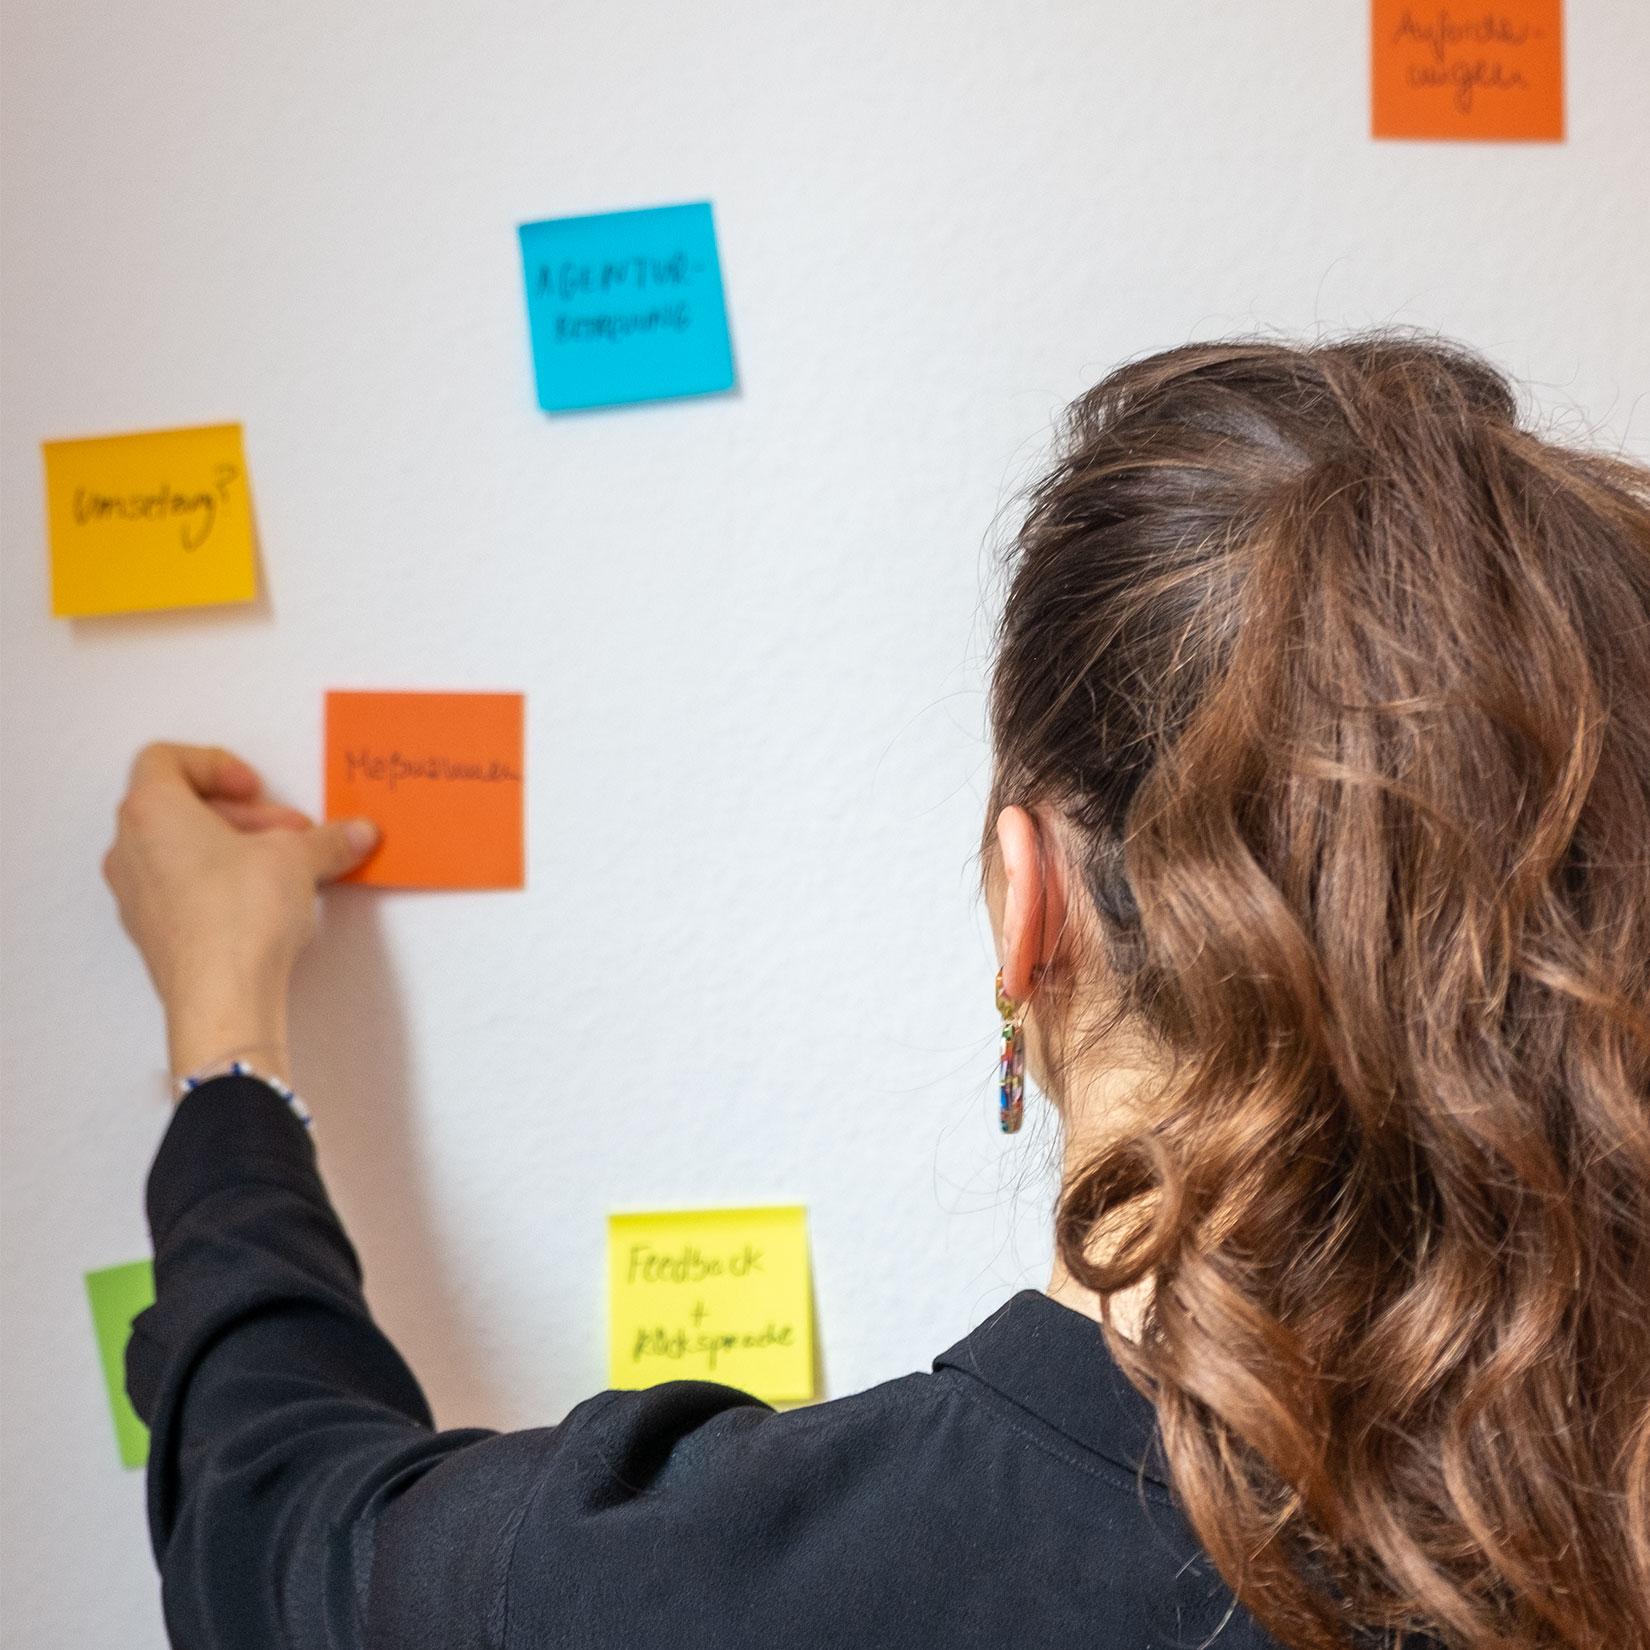 Markenting Brainstorming